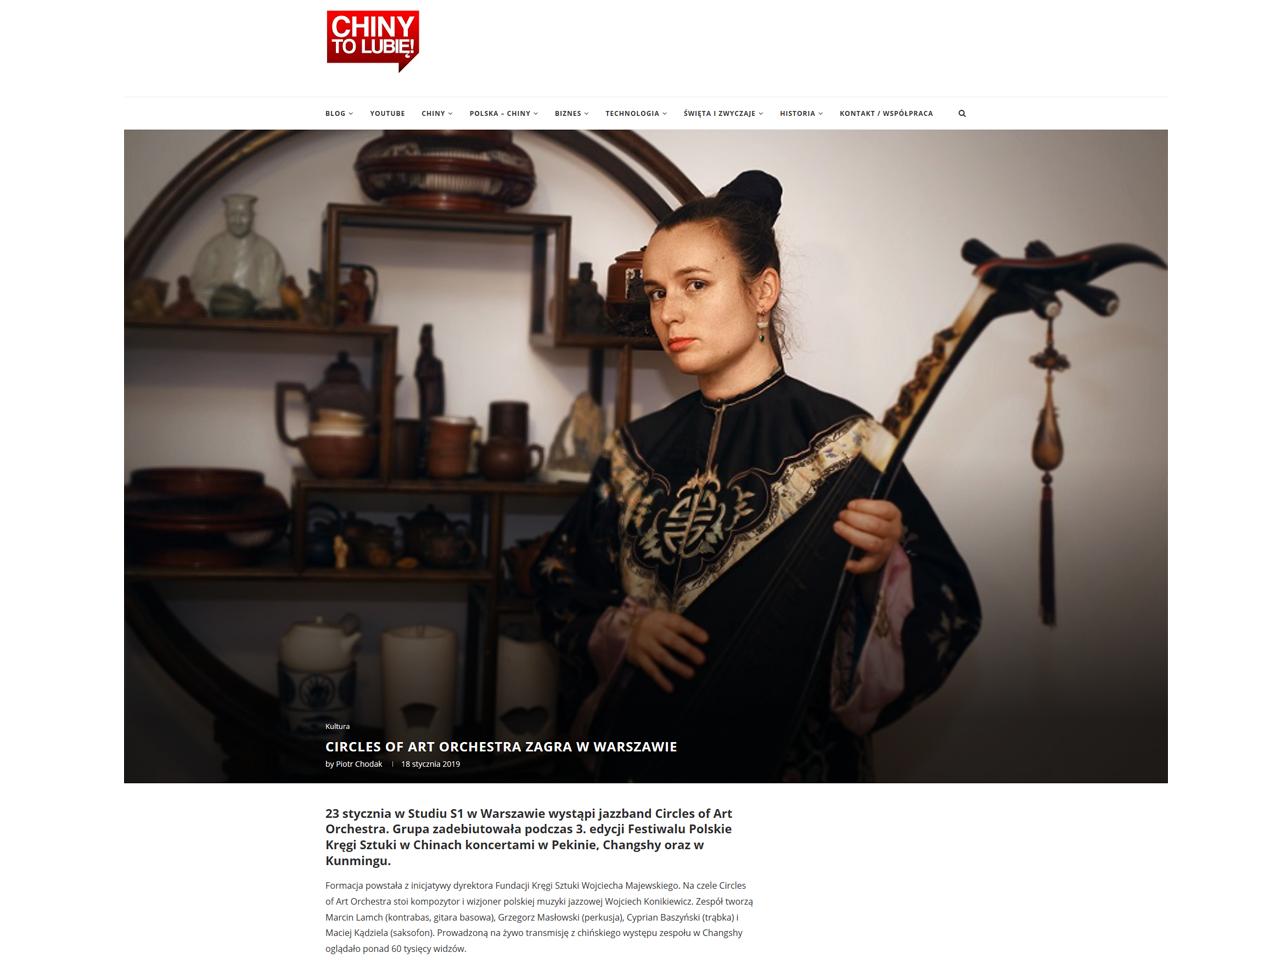 20190118_chinytolubie.pl